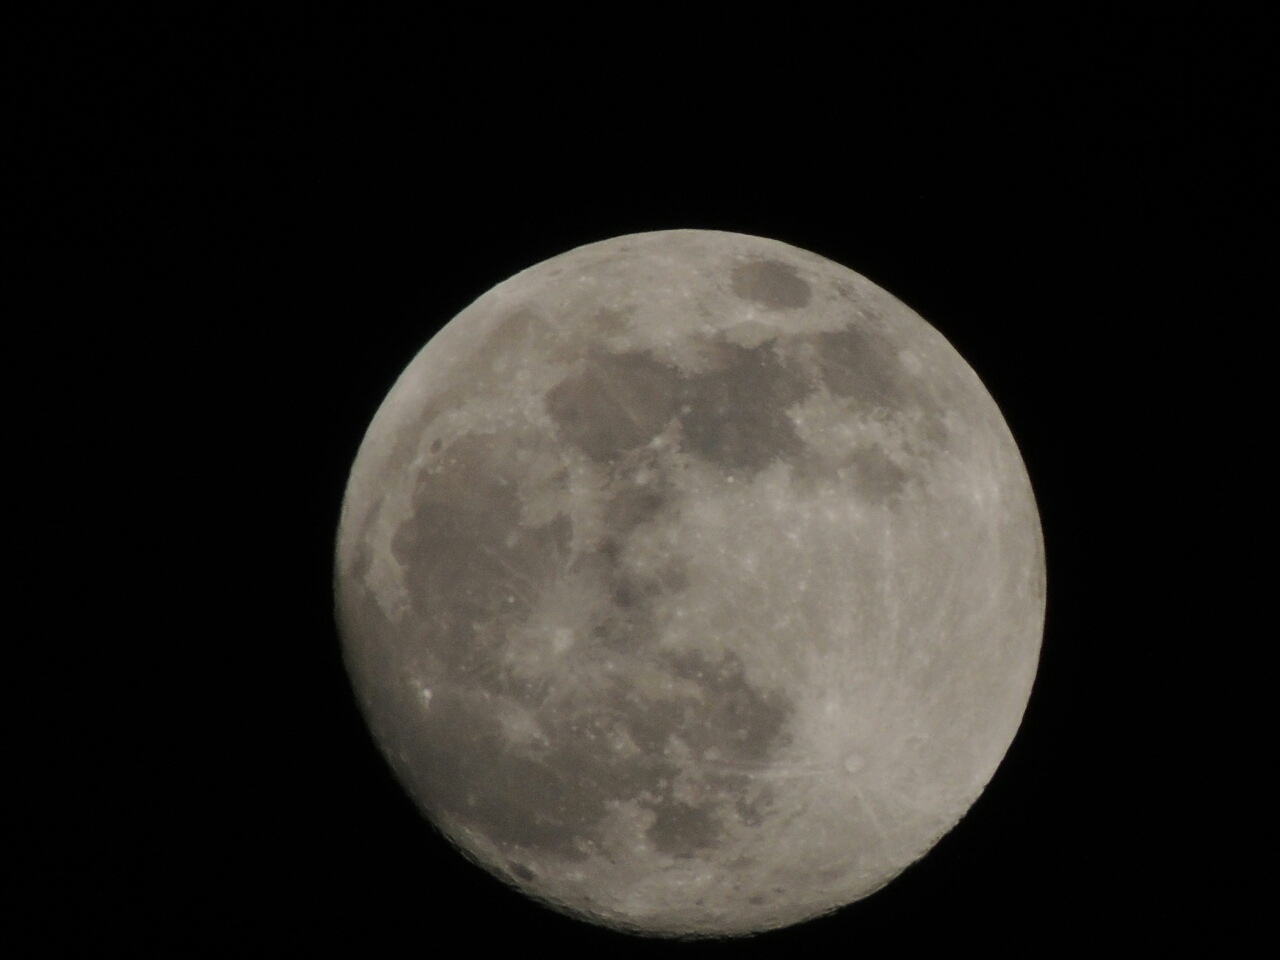 Сегодняшняя луна.